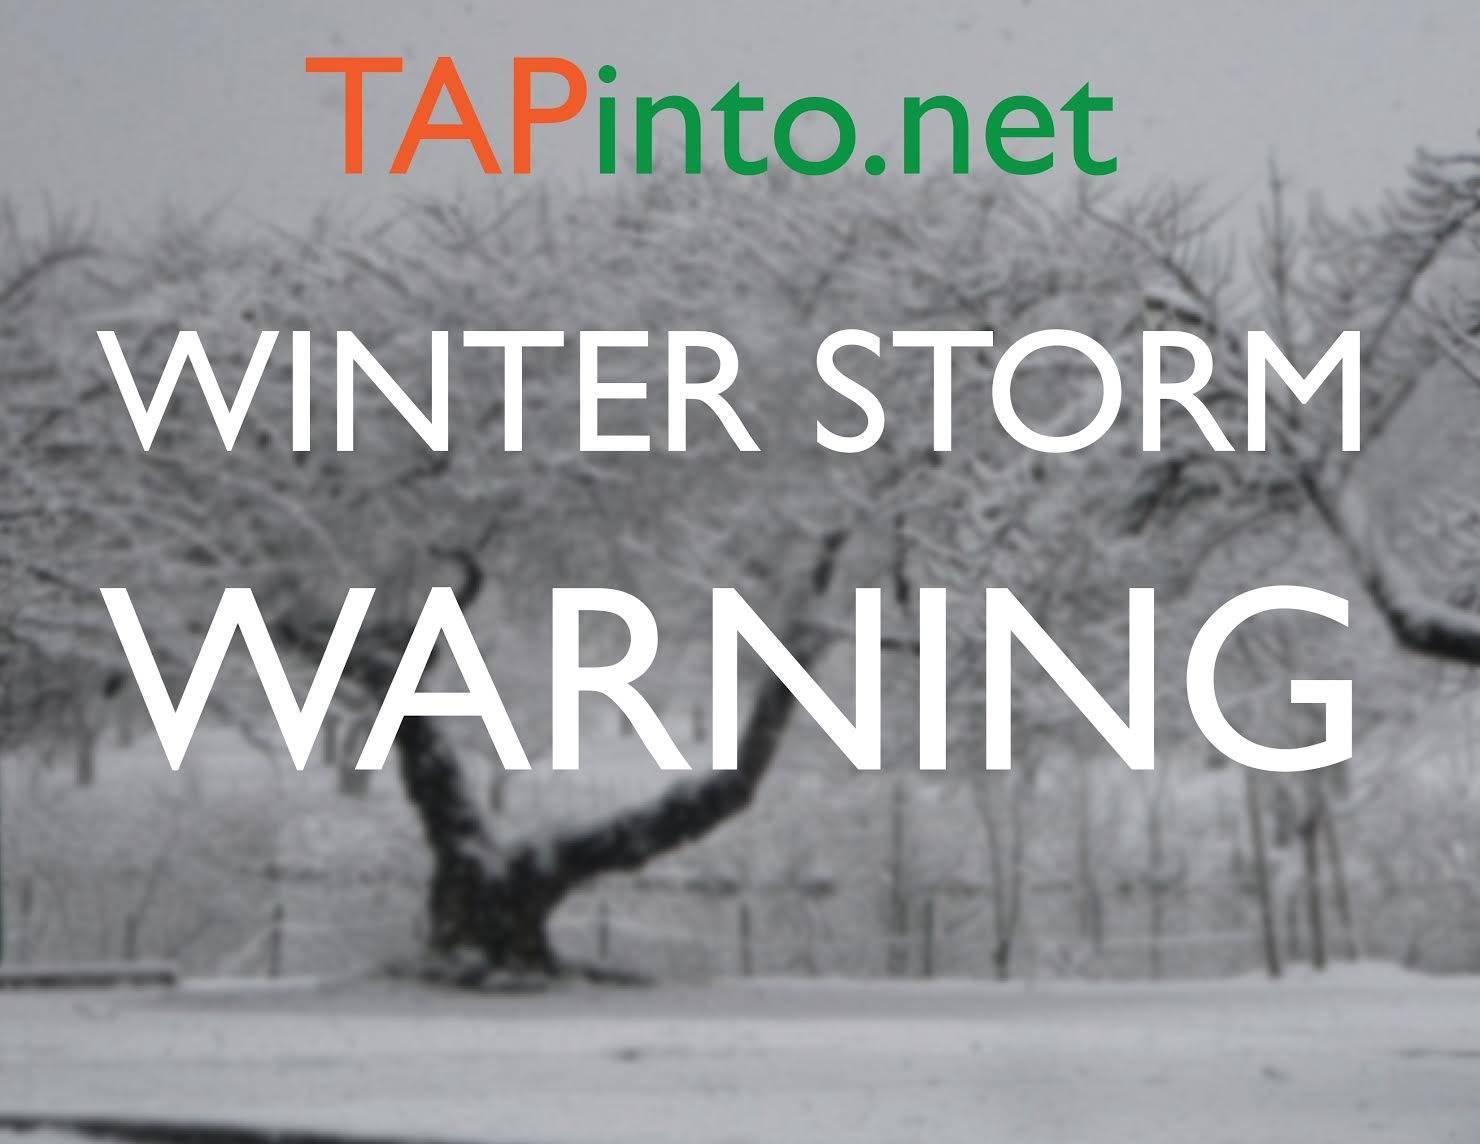 84c3076c257760181715_winter_storm.jpg